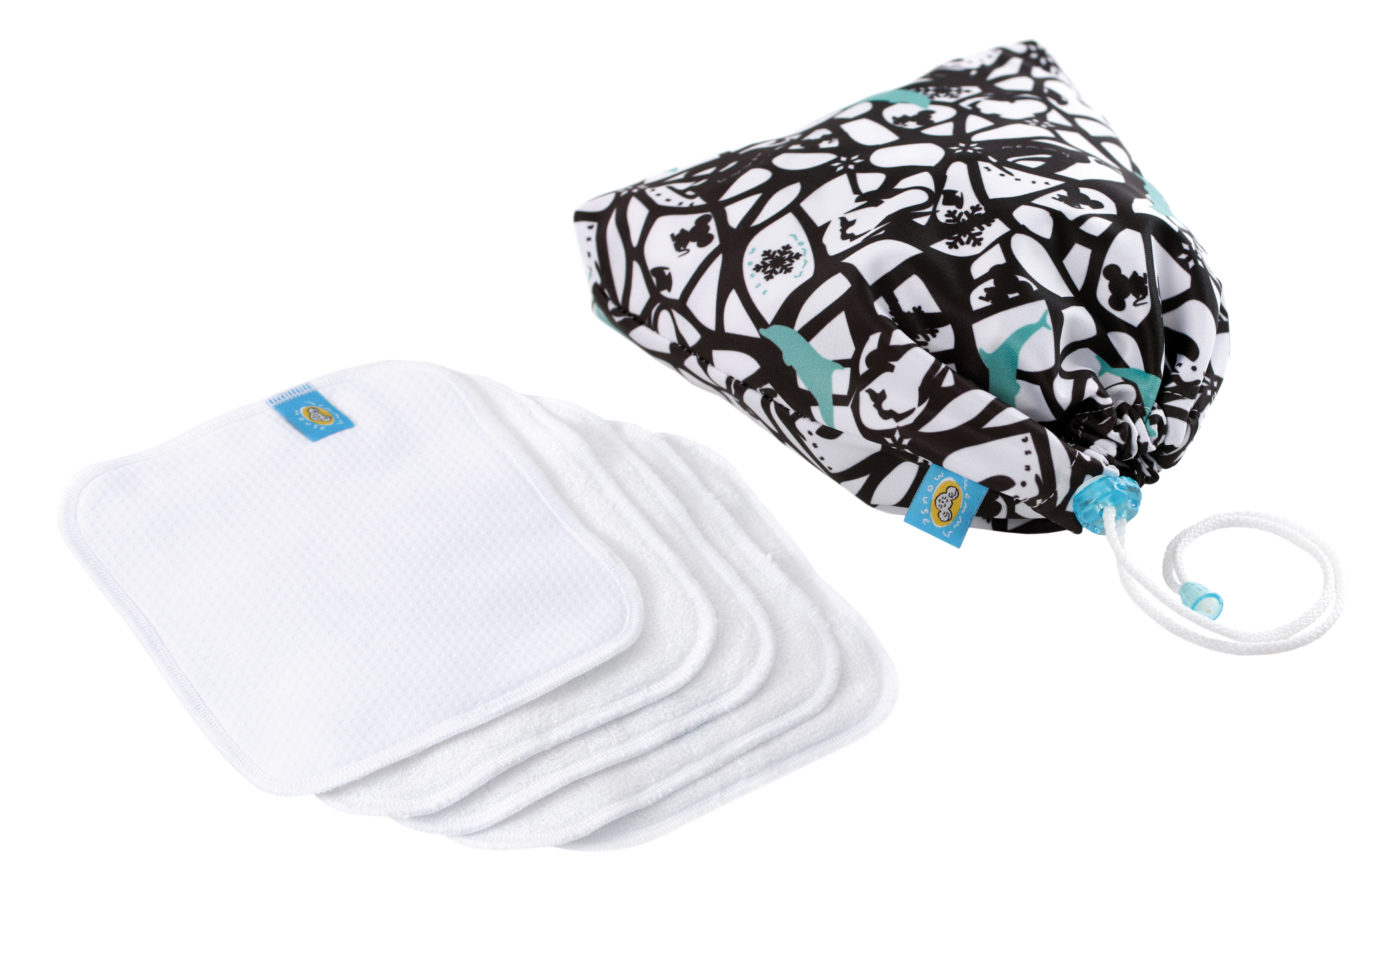 Reusable Wipe Pouch ADELLIA +  5pcs Reusable Wipes (COMBINED SET)